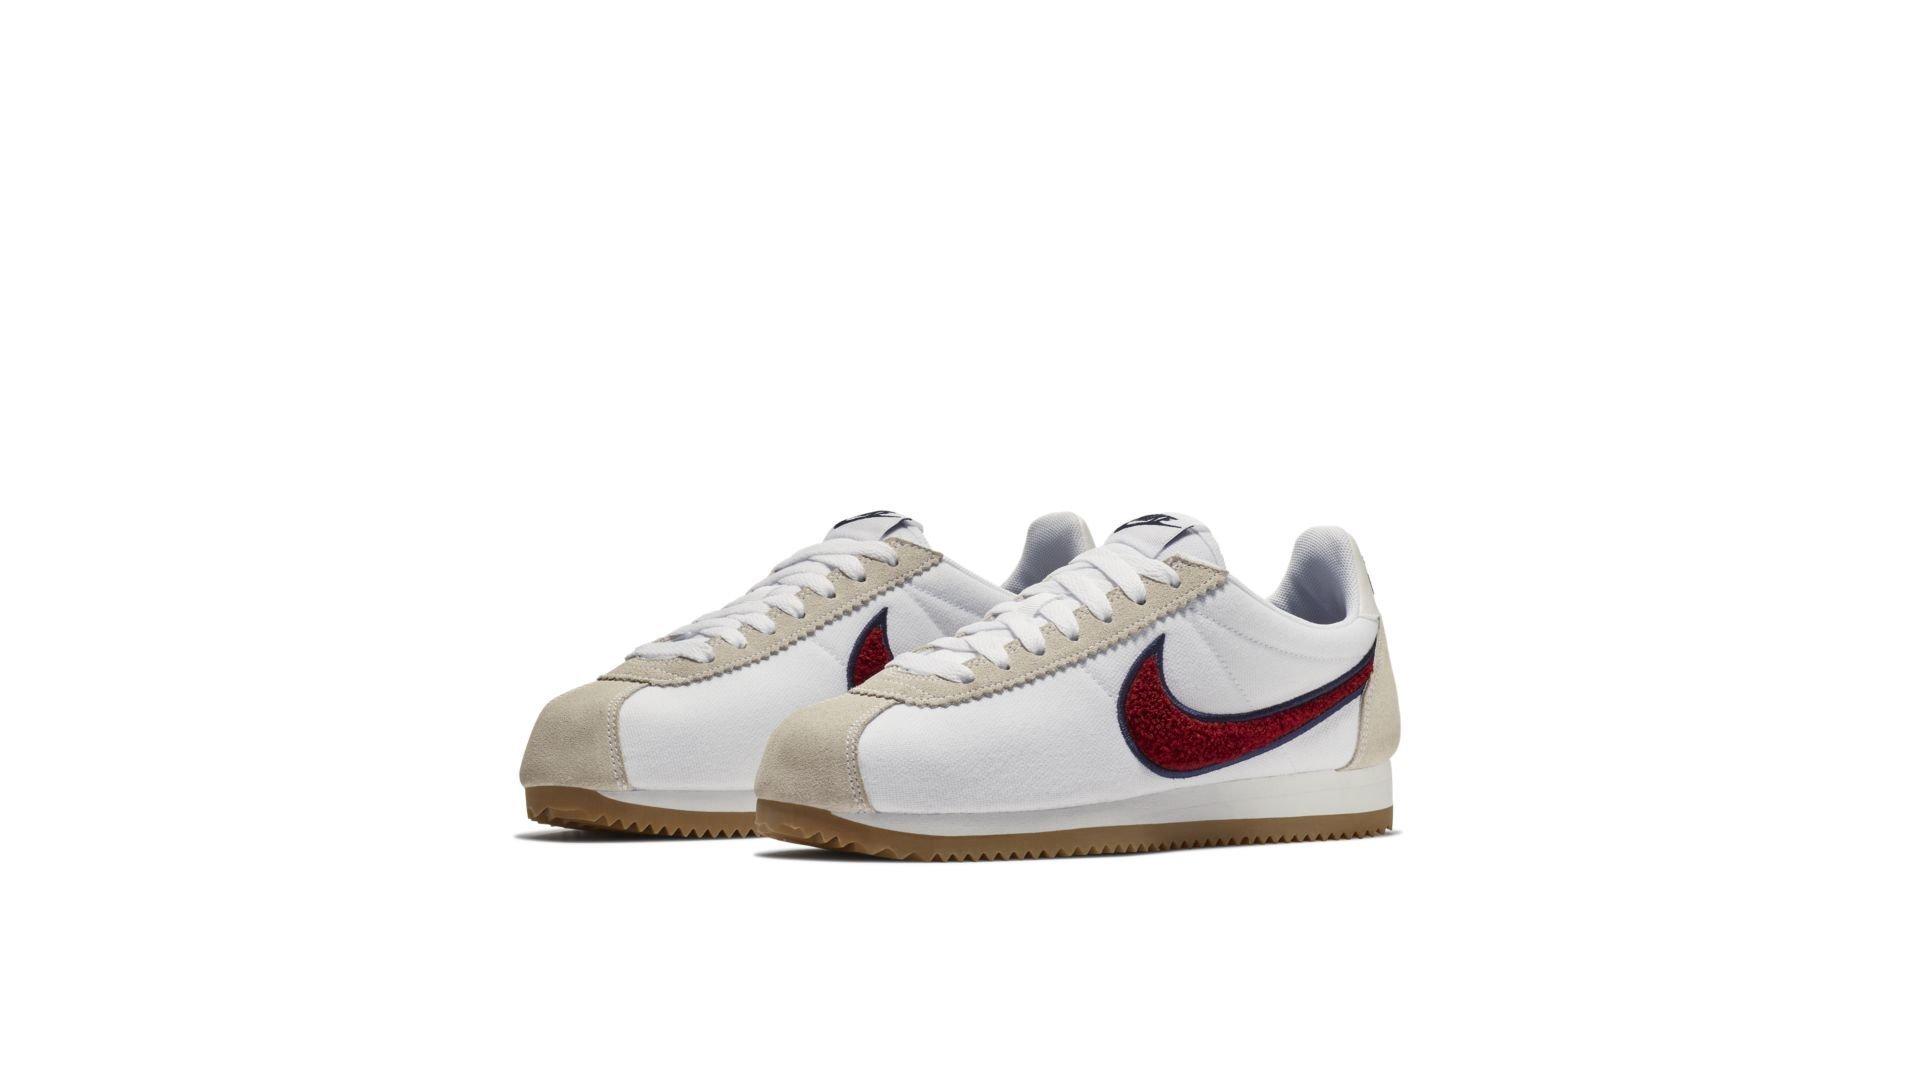 Nike Classic Cortez Chenille Swoosh Red Crush (W) (905614-103)